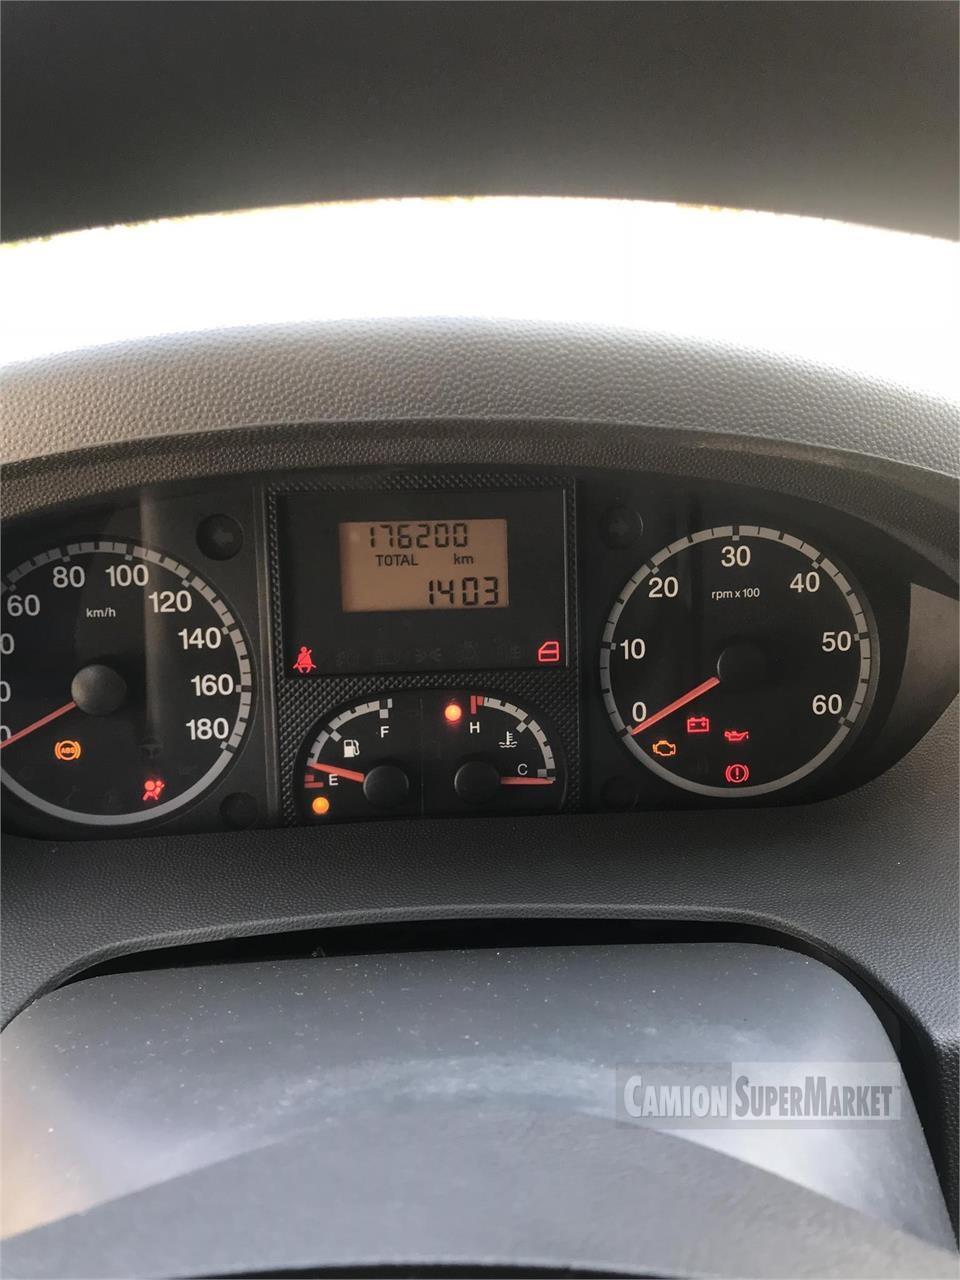 Fiat DUCATO MAXI used 2008 Lombardia